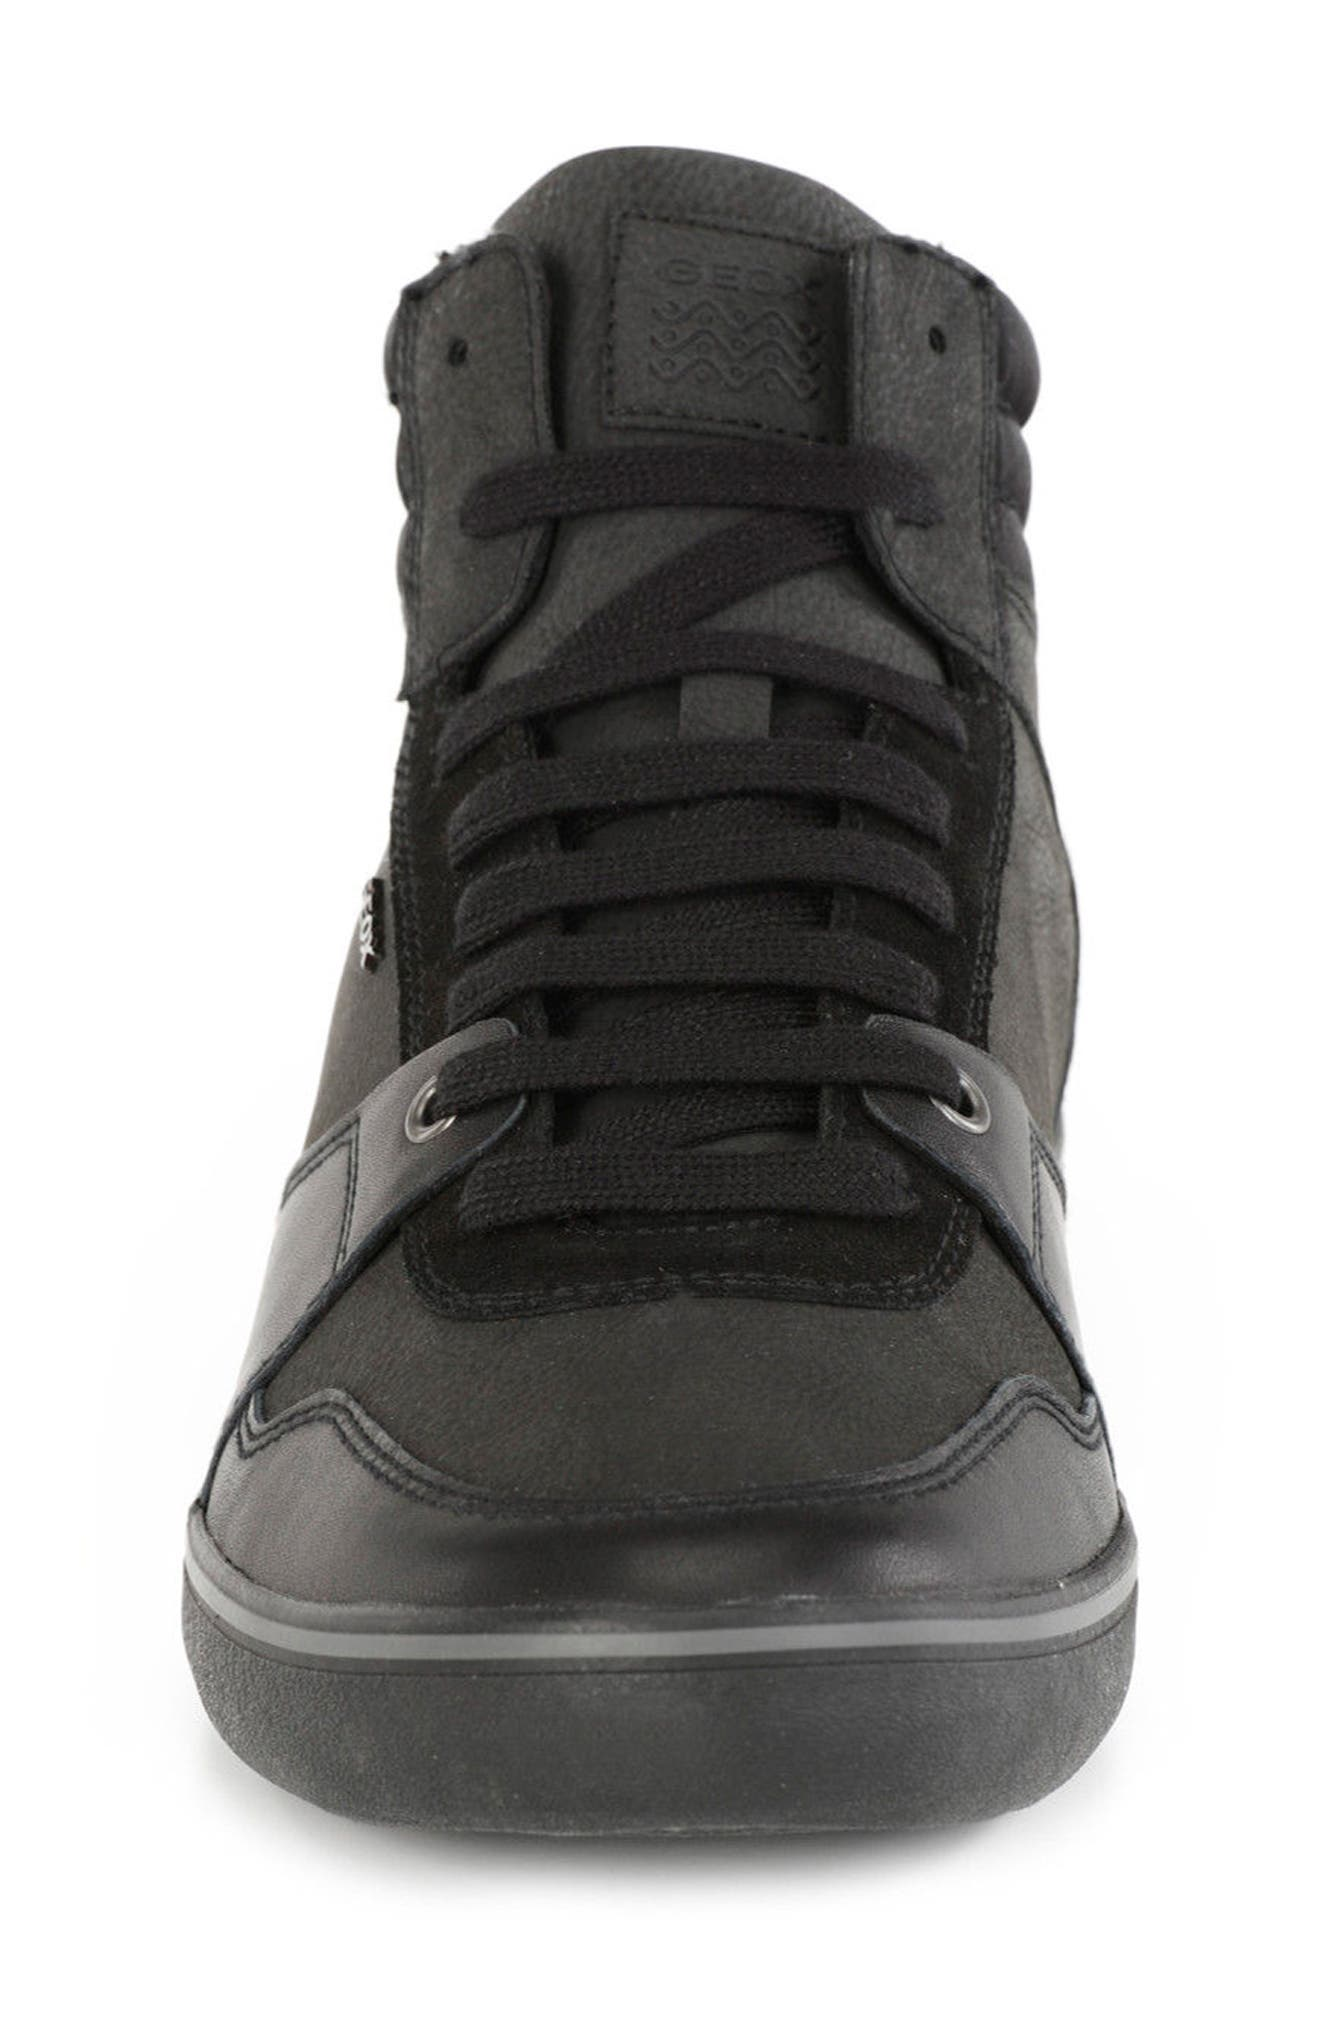 Box 31 High Top Sneaker,                             Alternate thumbnail 4, color,                             Black